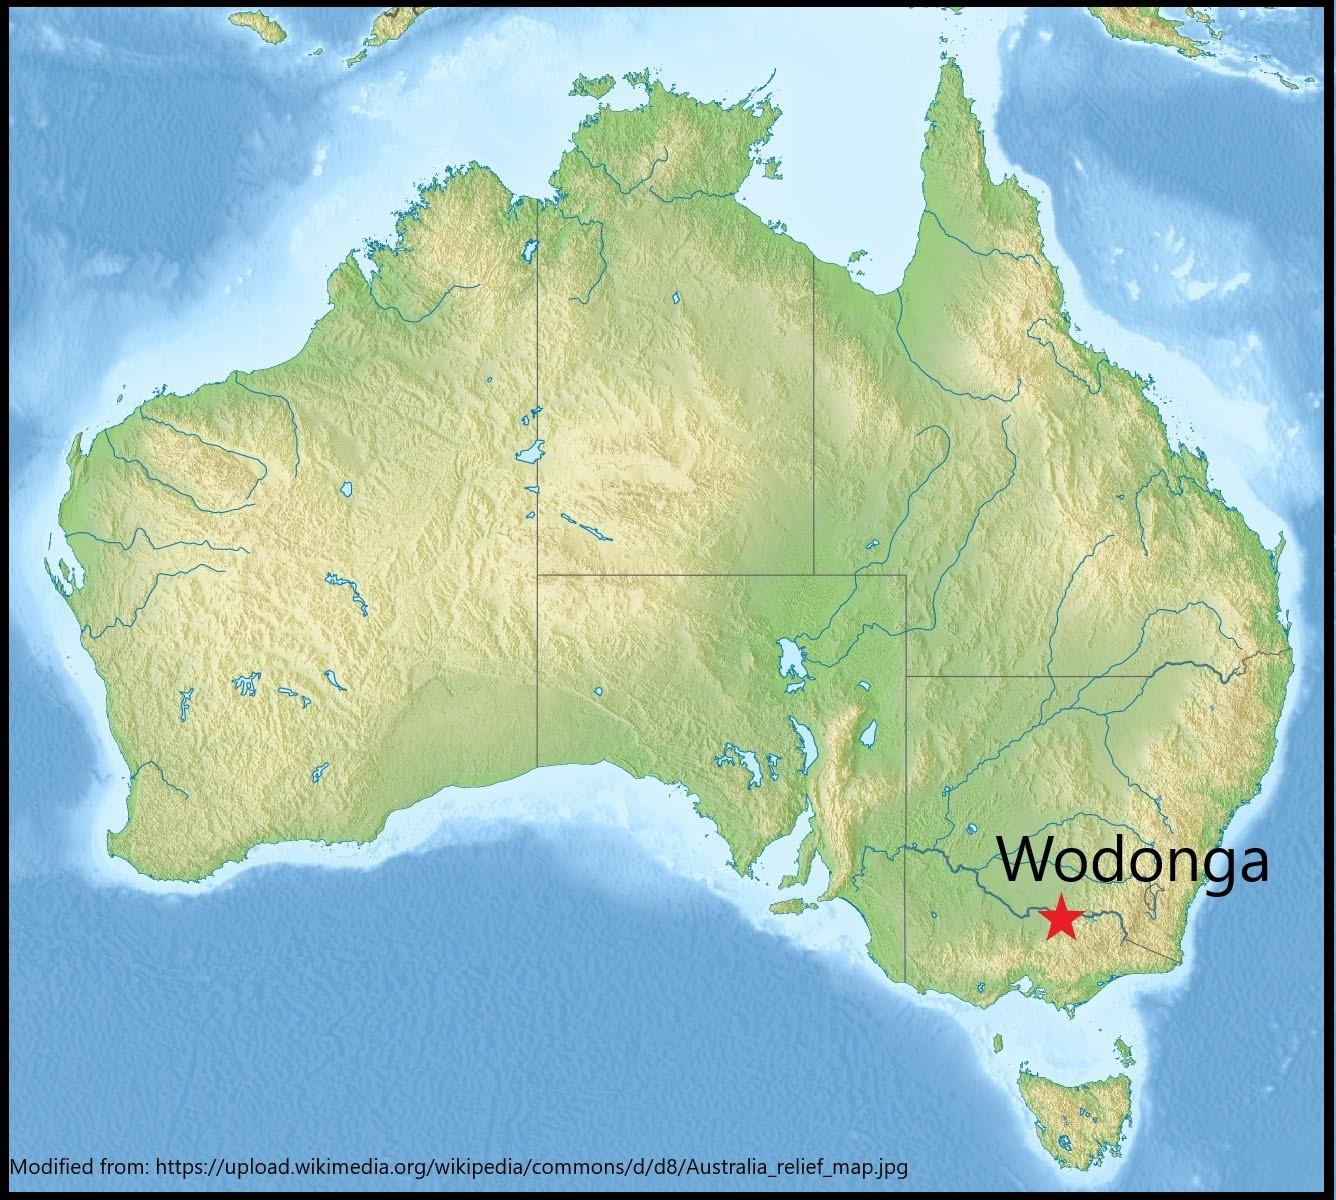 Australia_relief_map.jpg